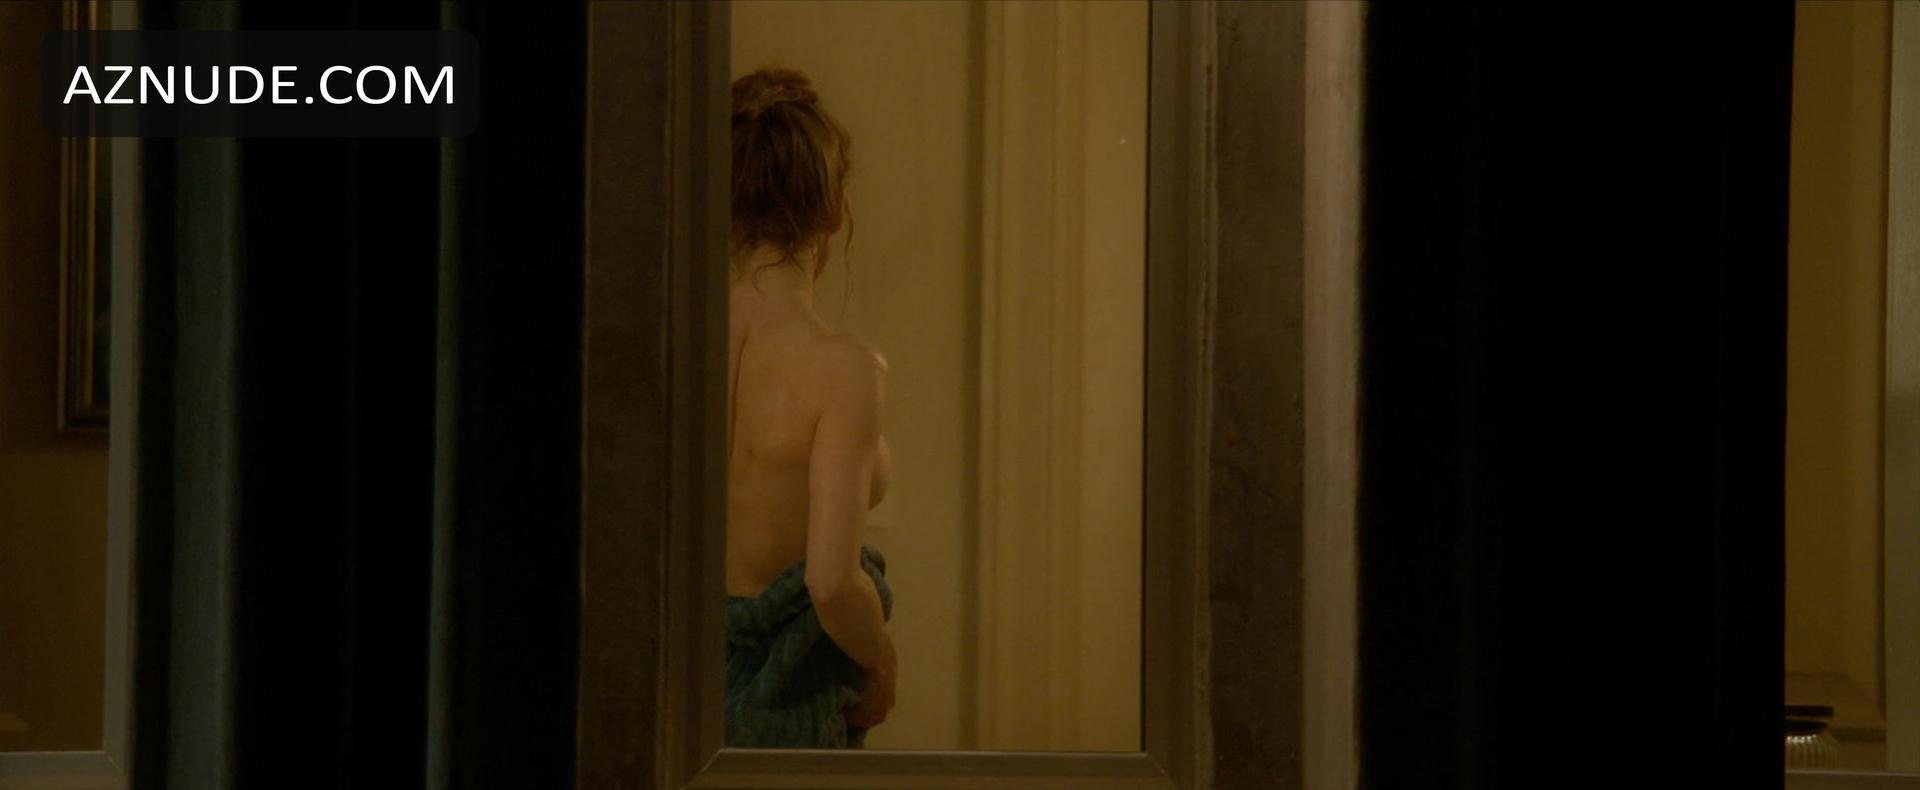 renee zellweger nude photo